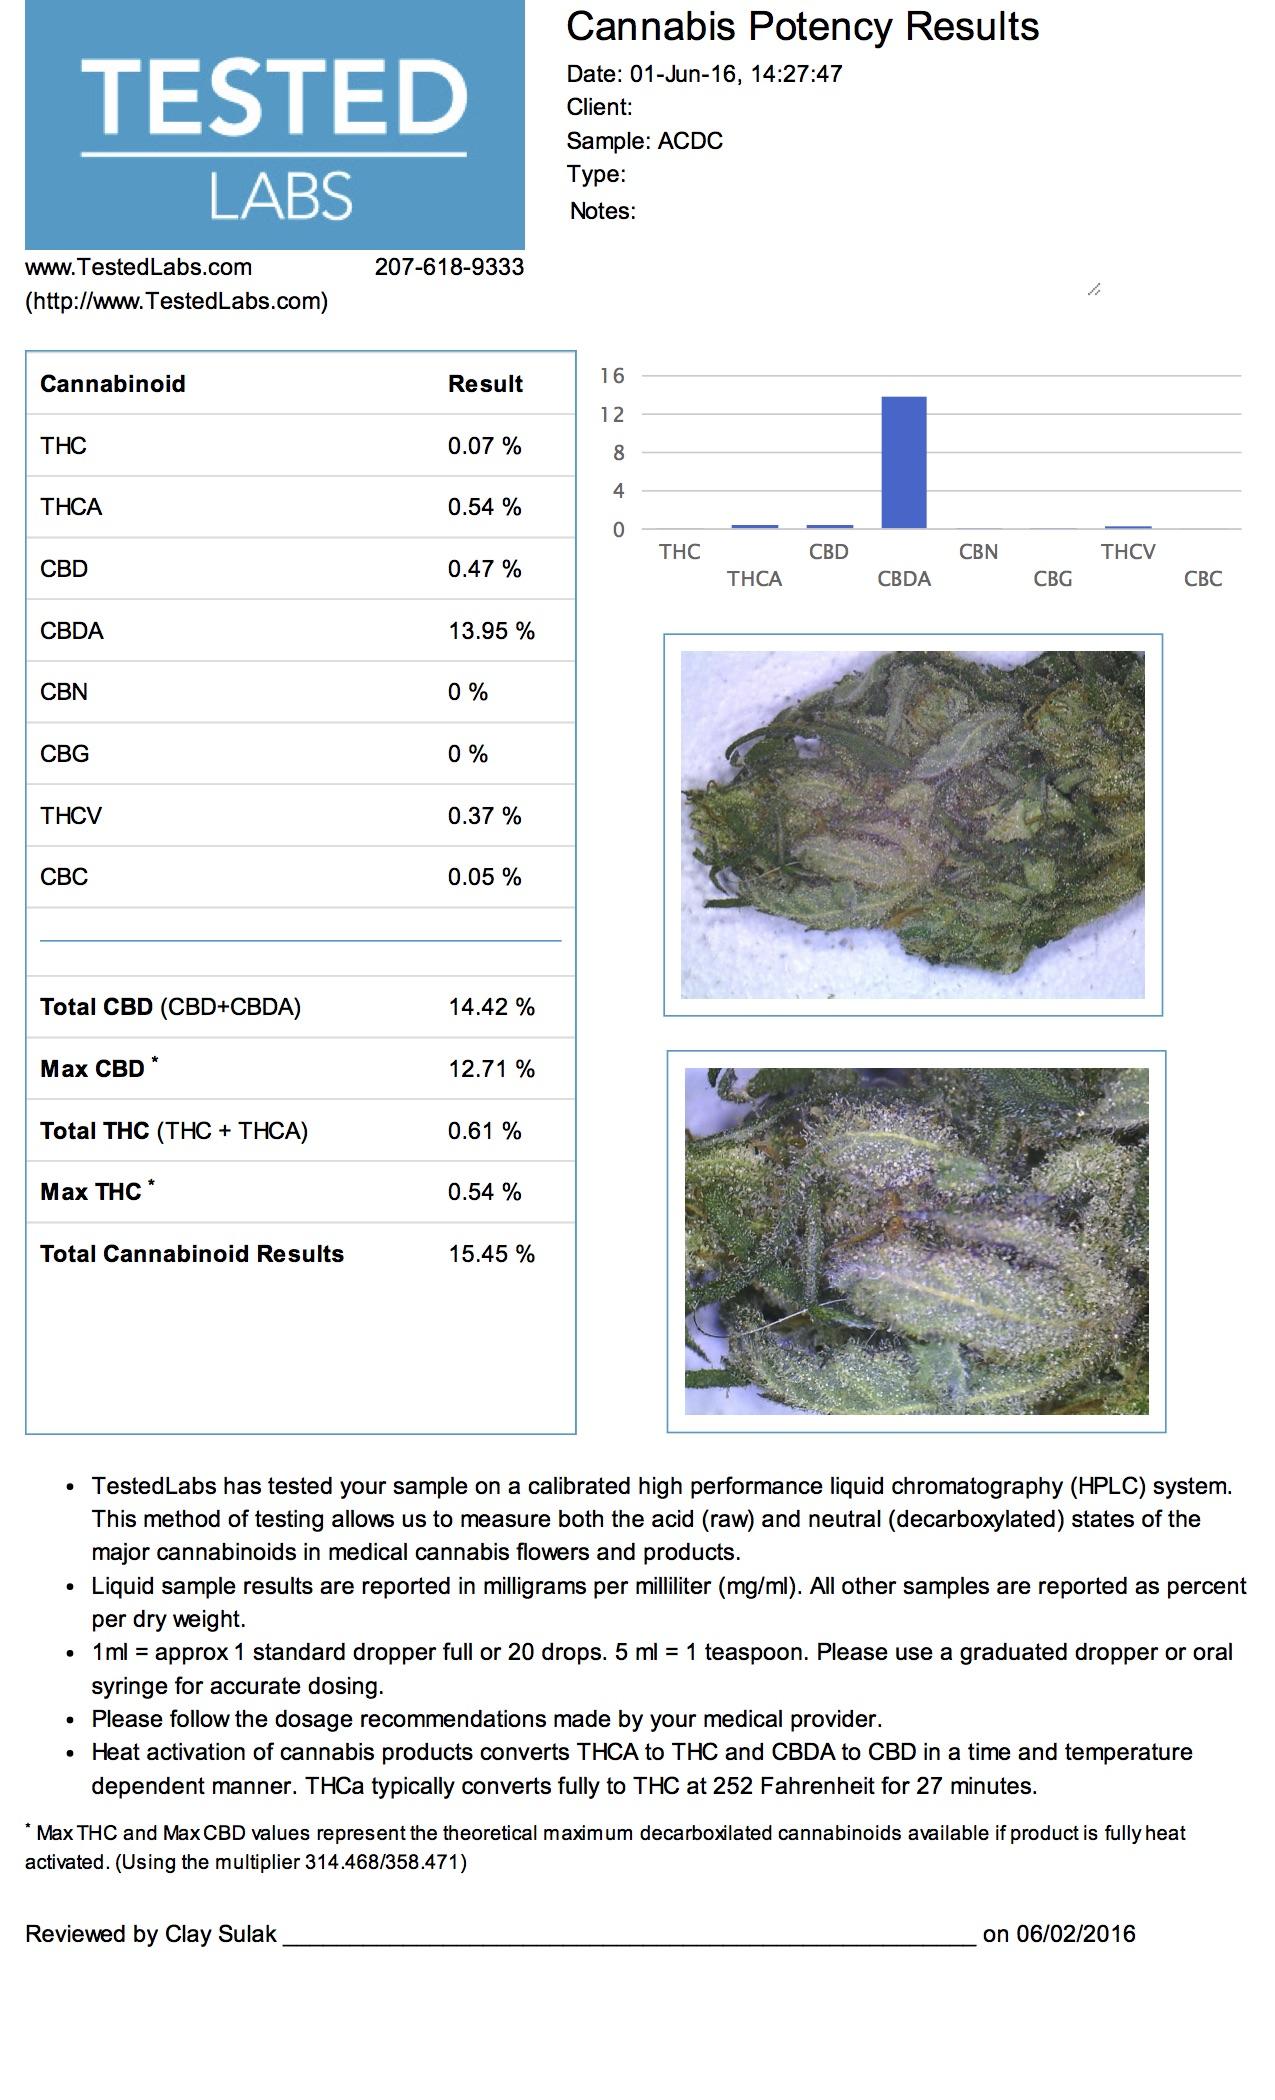 ACDC (Cannabinoid)